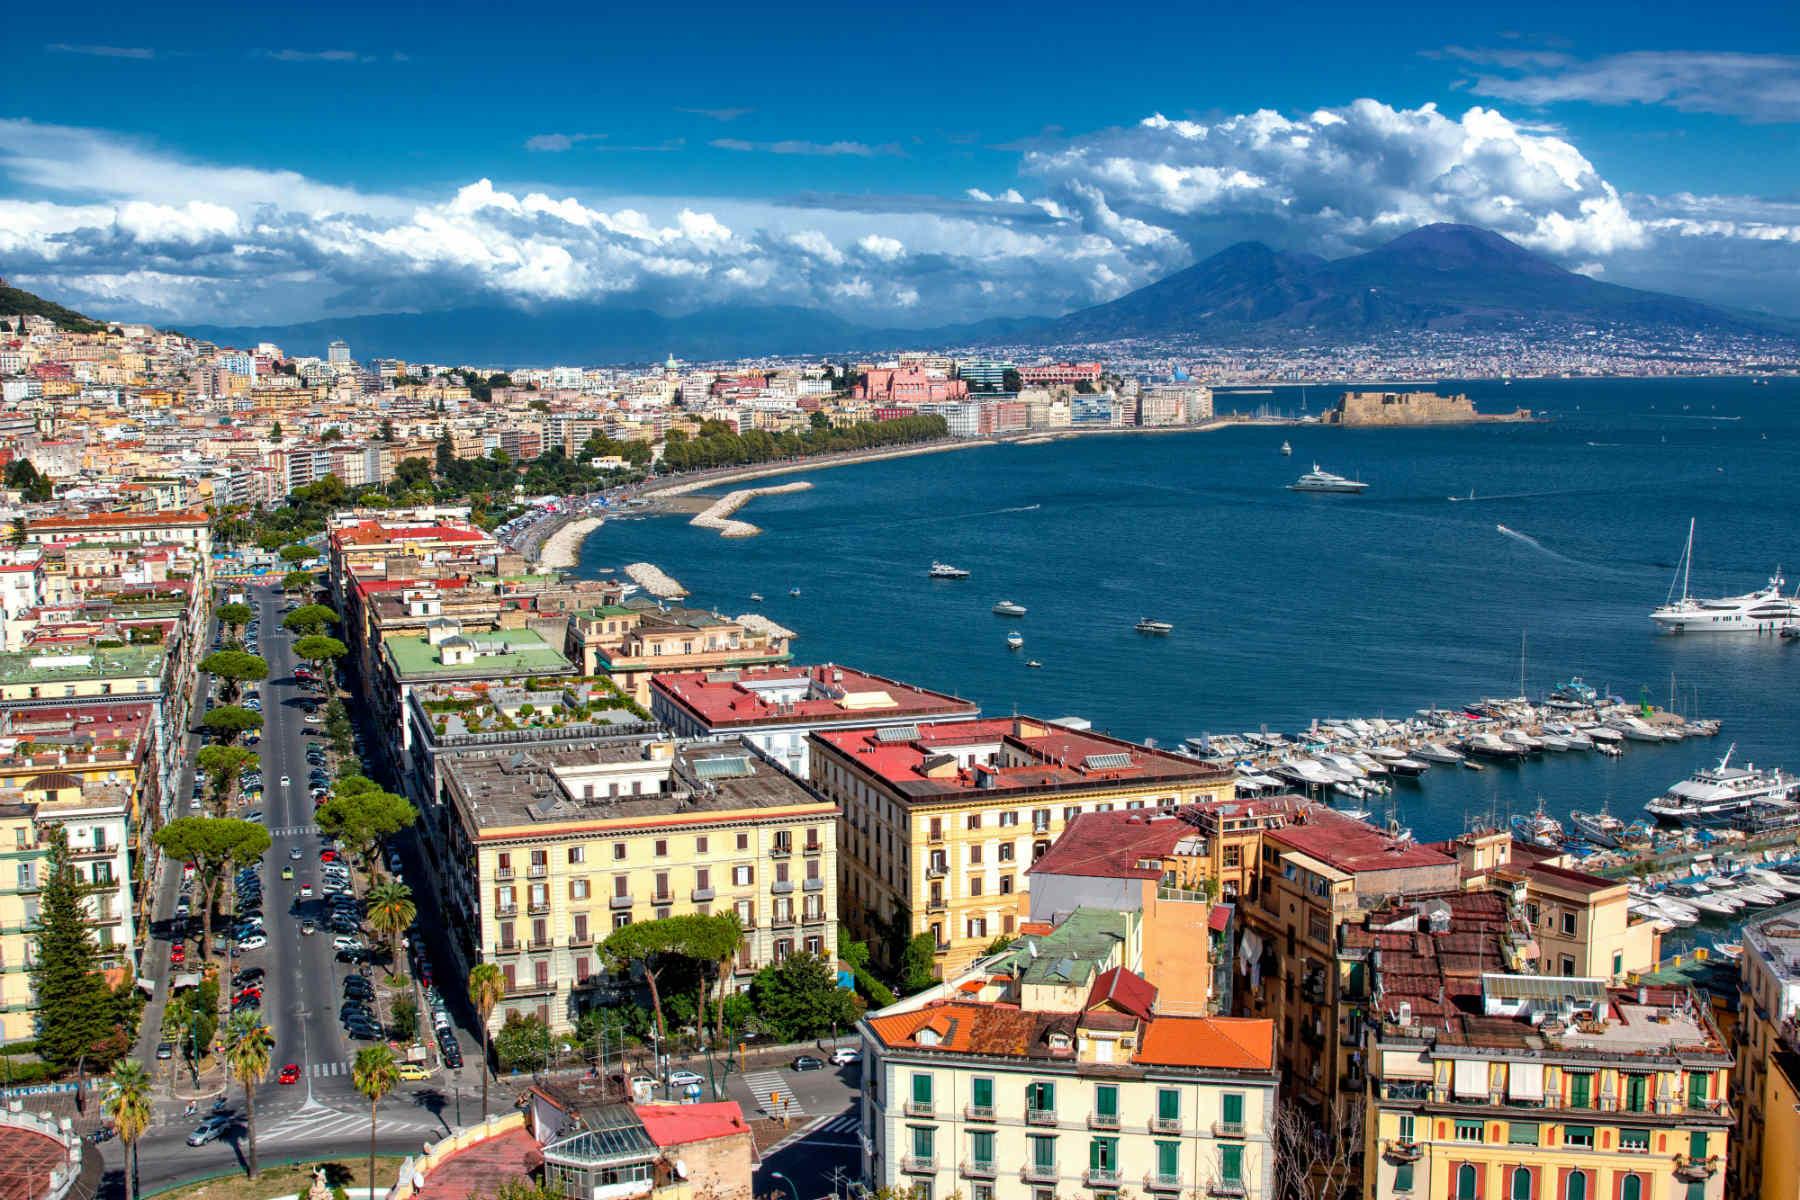 Napoli, inumana indifferenza.